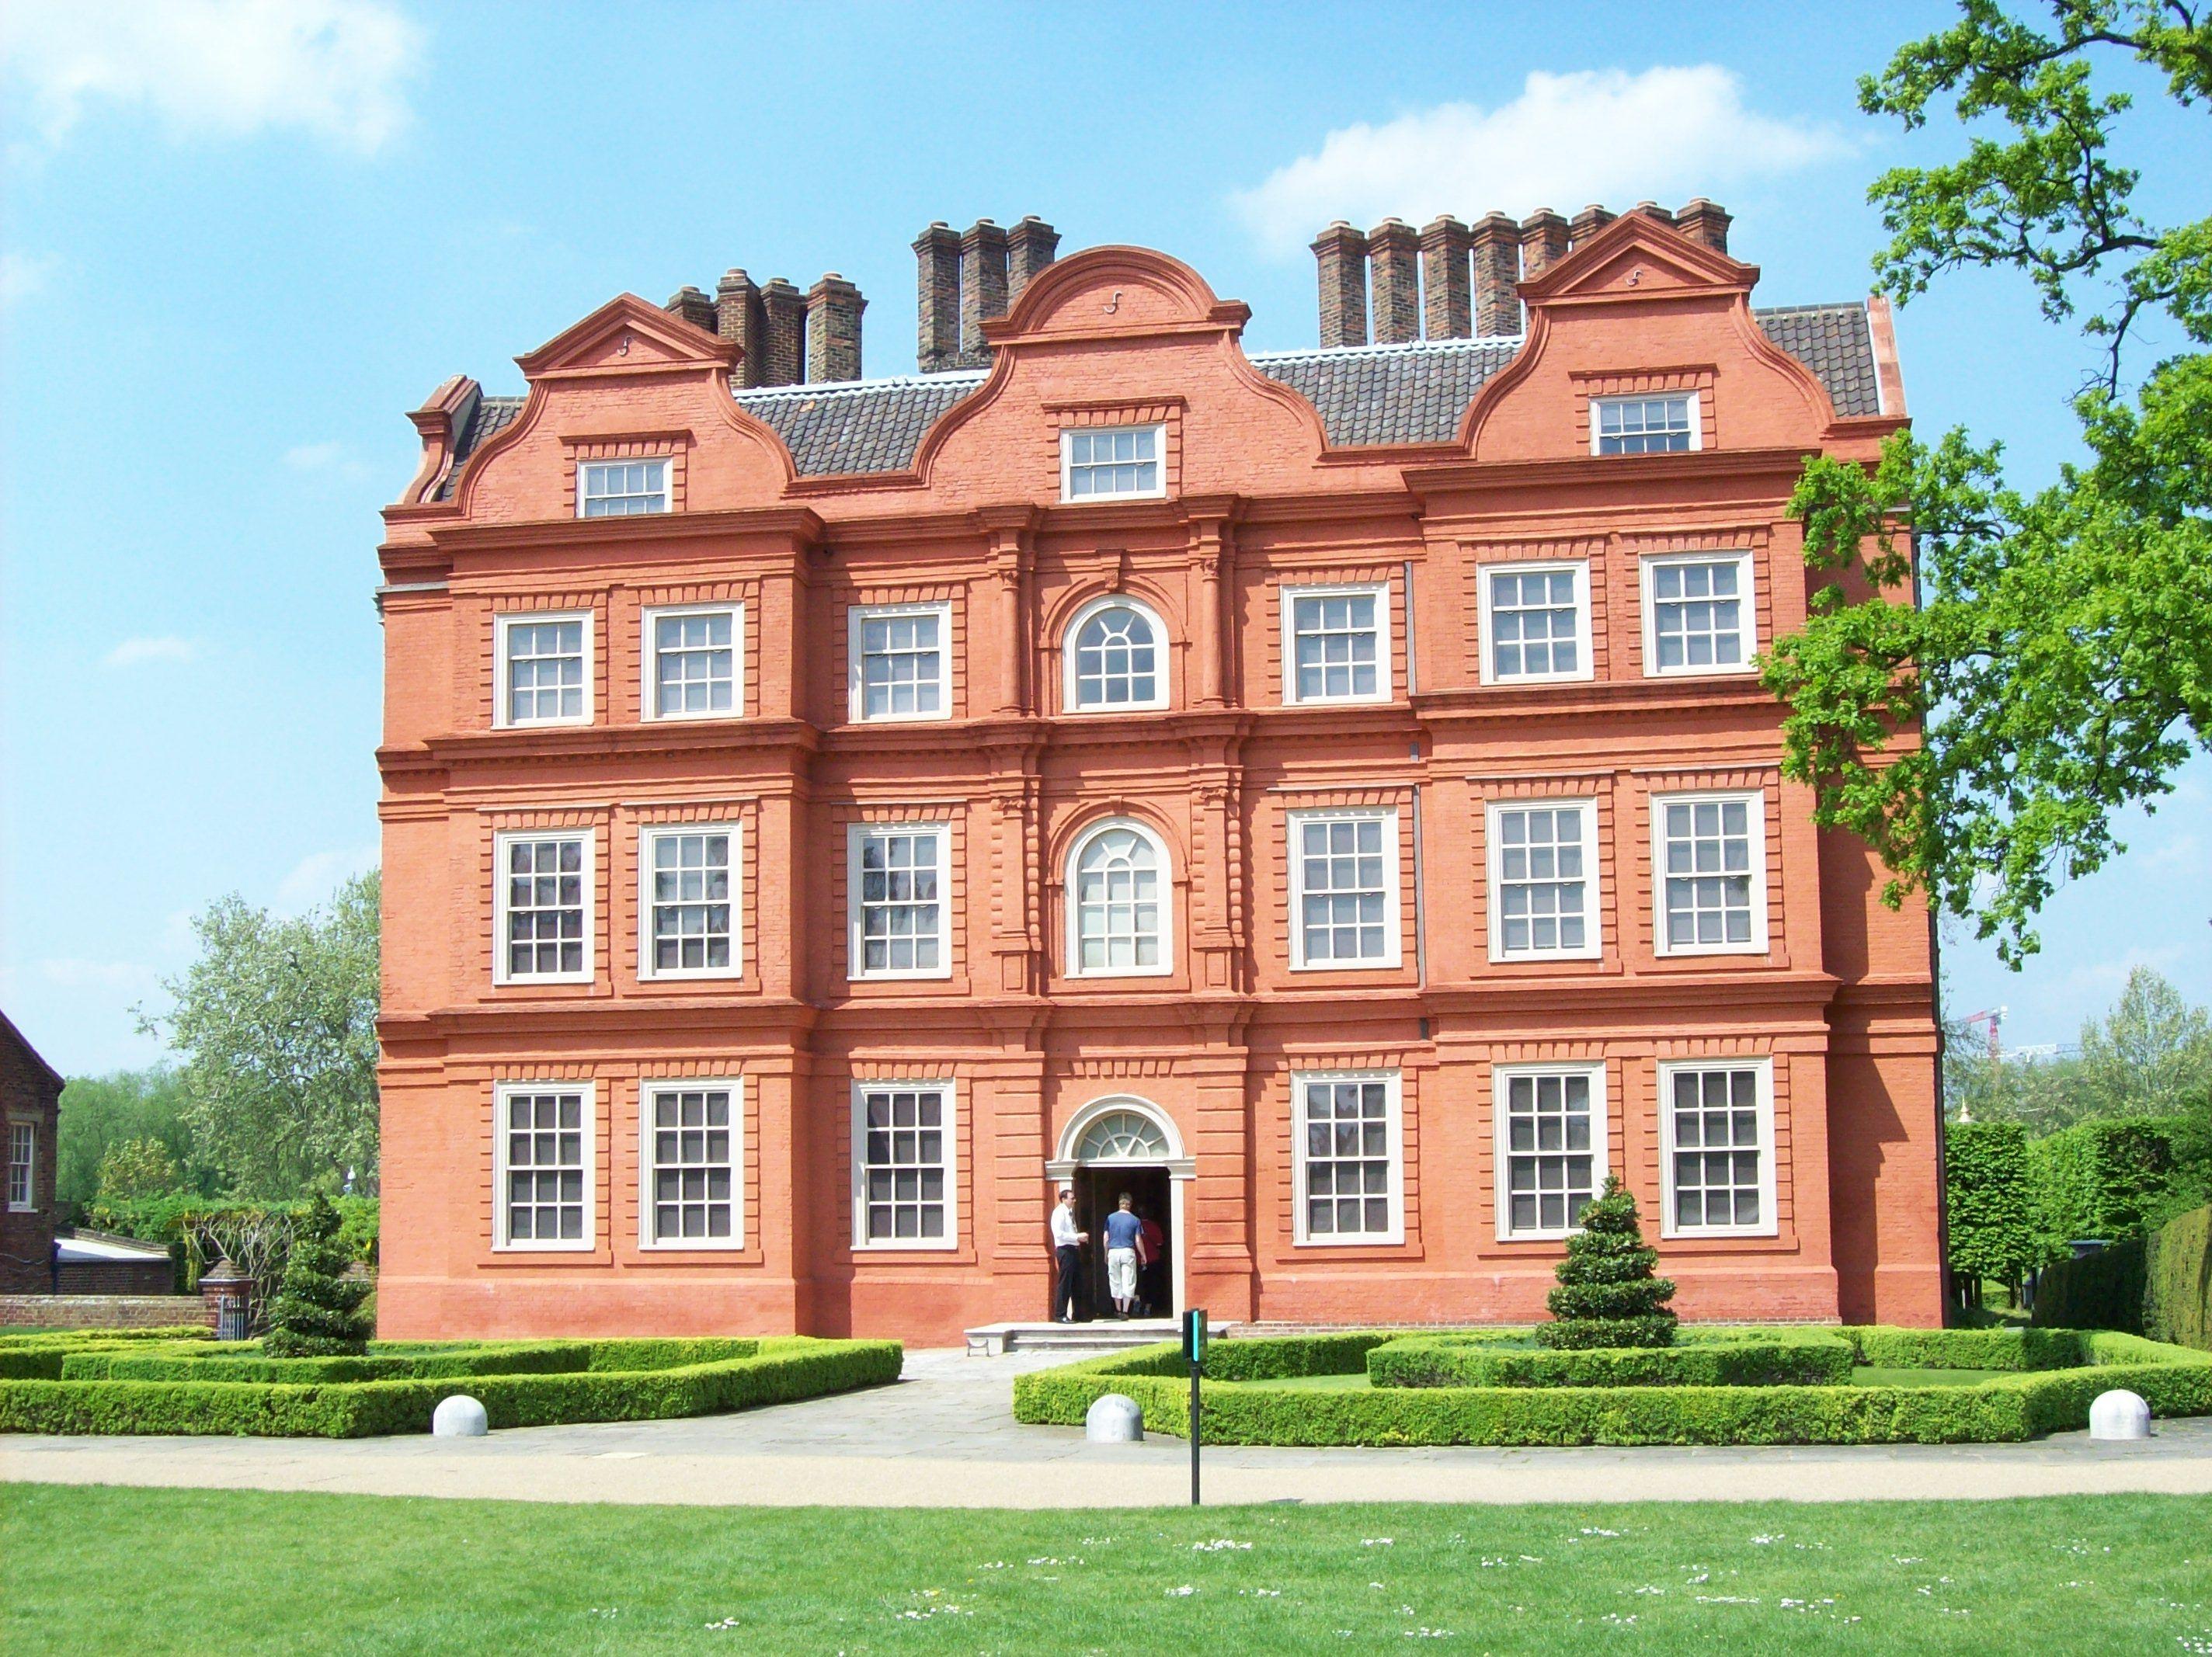 02c1f5bd820c172a99223afc775c78a3 - Royal Botanic Gardens And Kew Palace